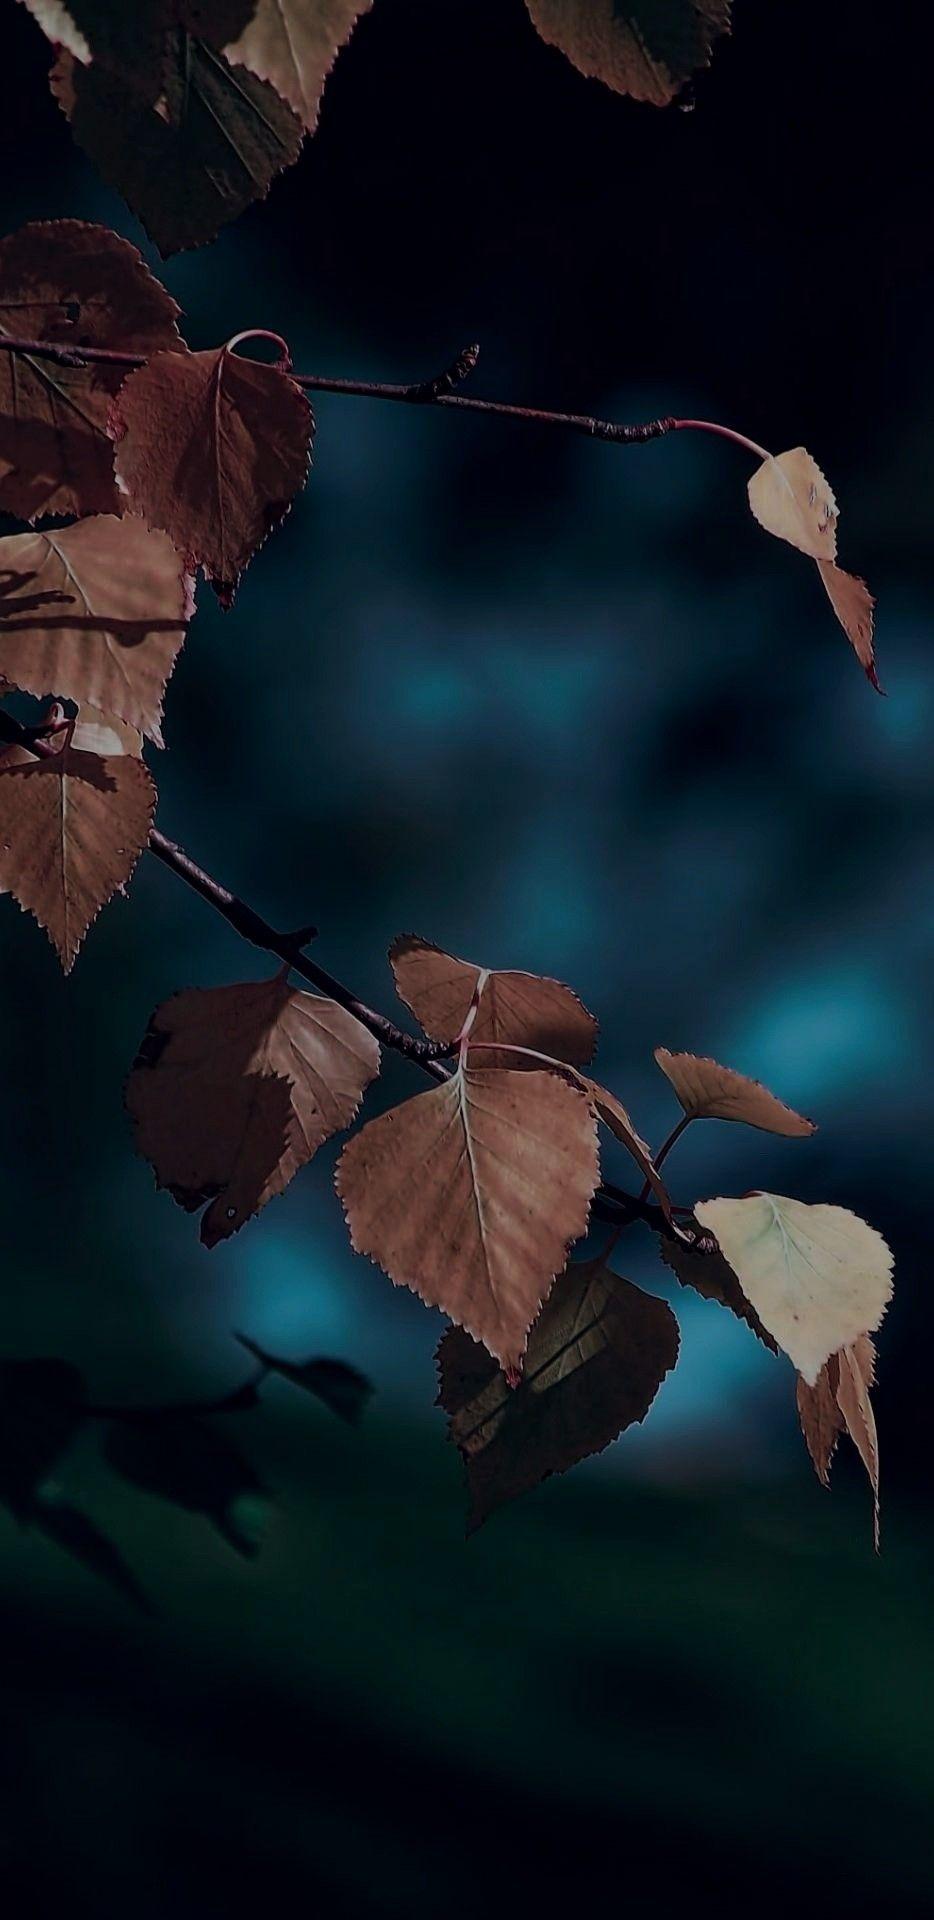 iOS 11, iPhone X, dark, blue, leaves, Autumn, apple